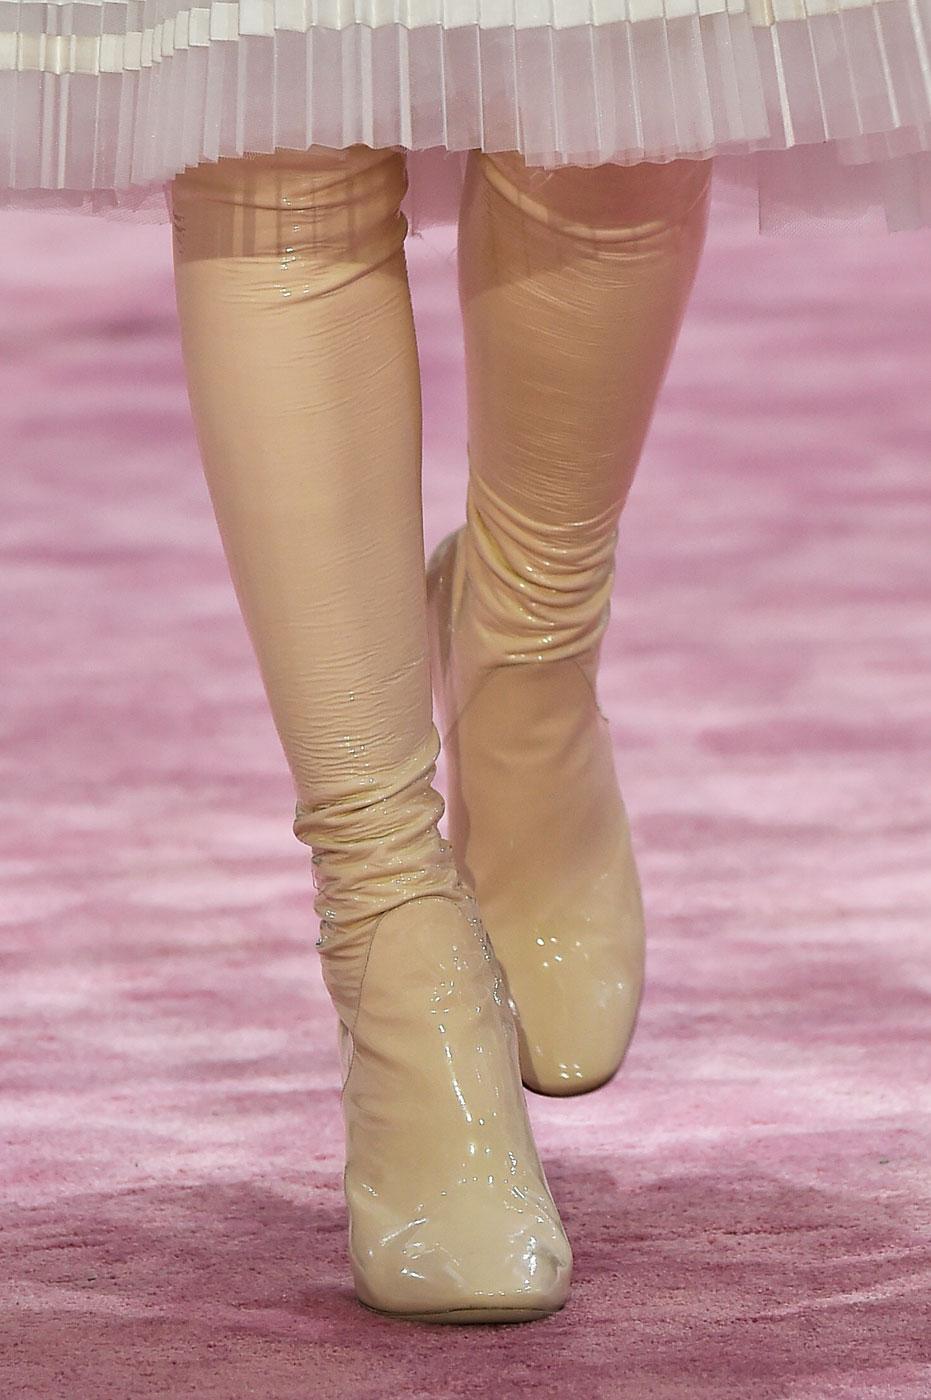 Christian-Dior-fashion-runway-show-close-ups-haute-couture-paris-spring-summer-2015-the-impression-143